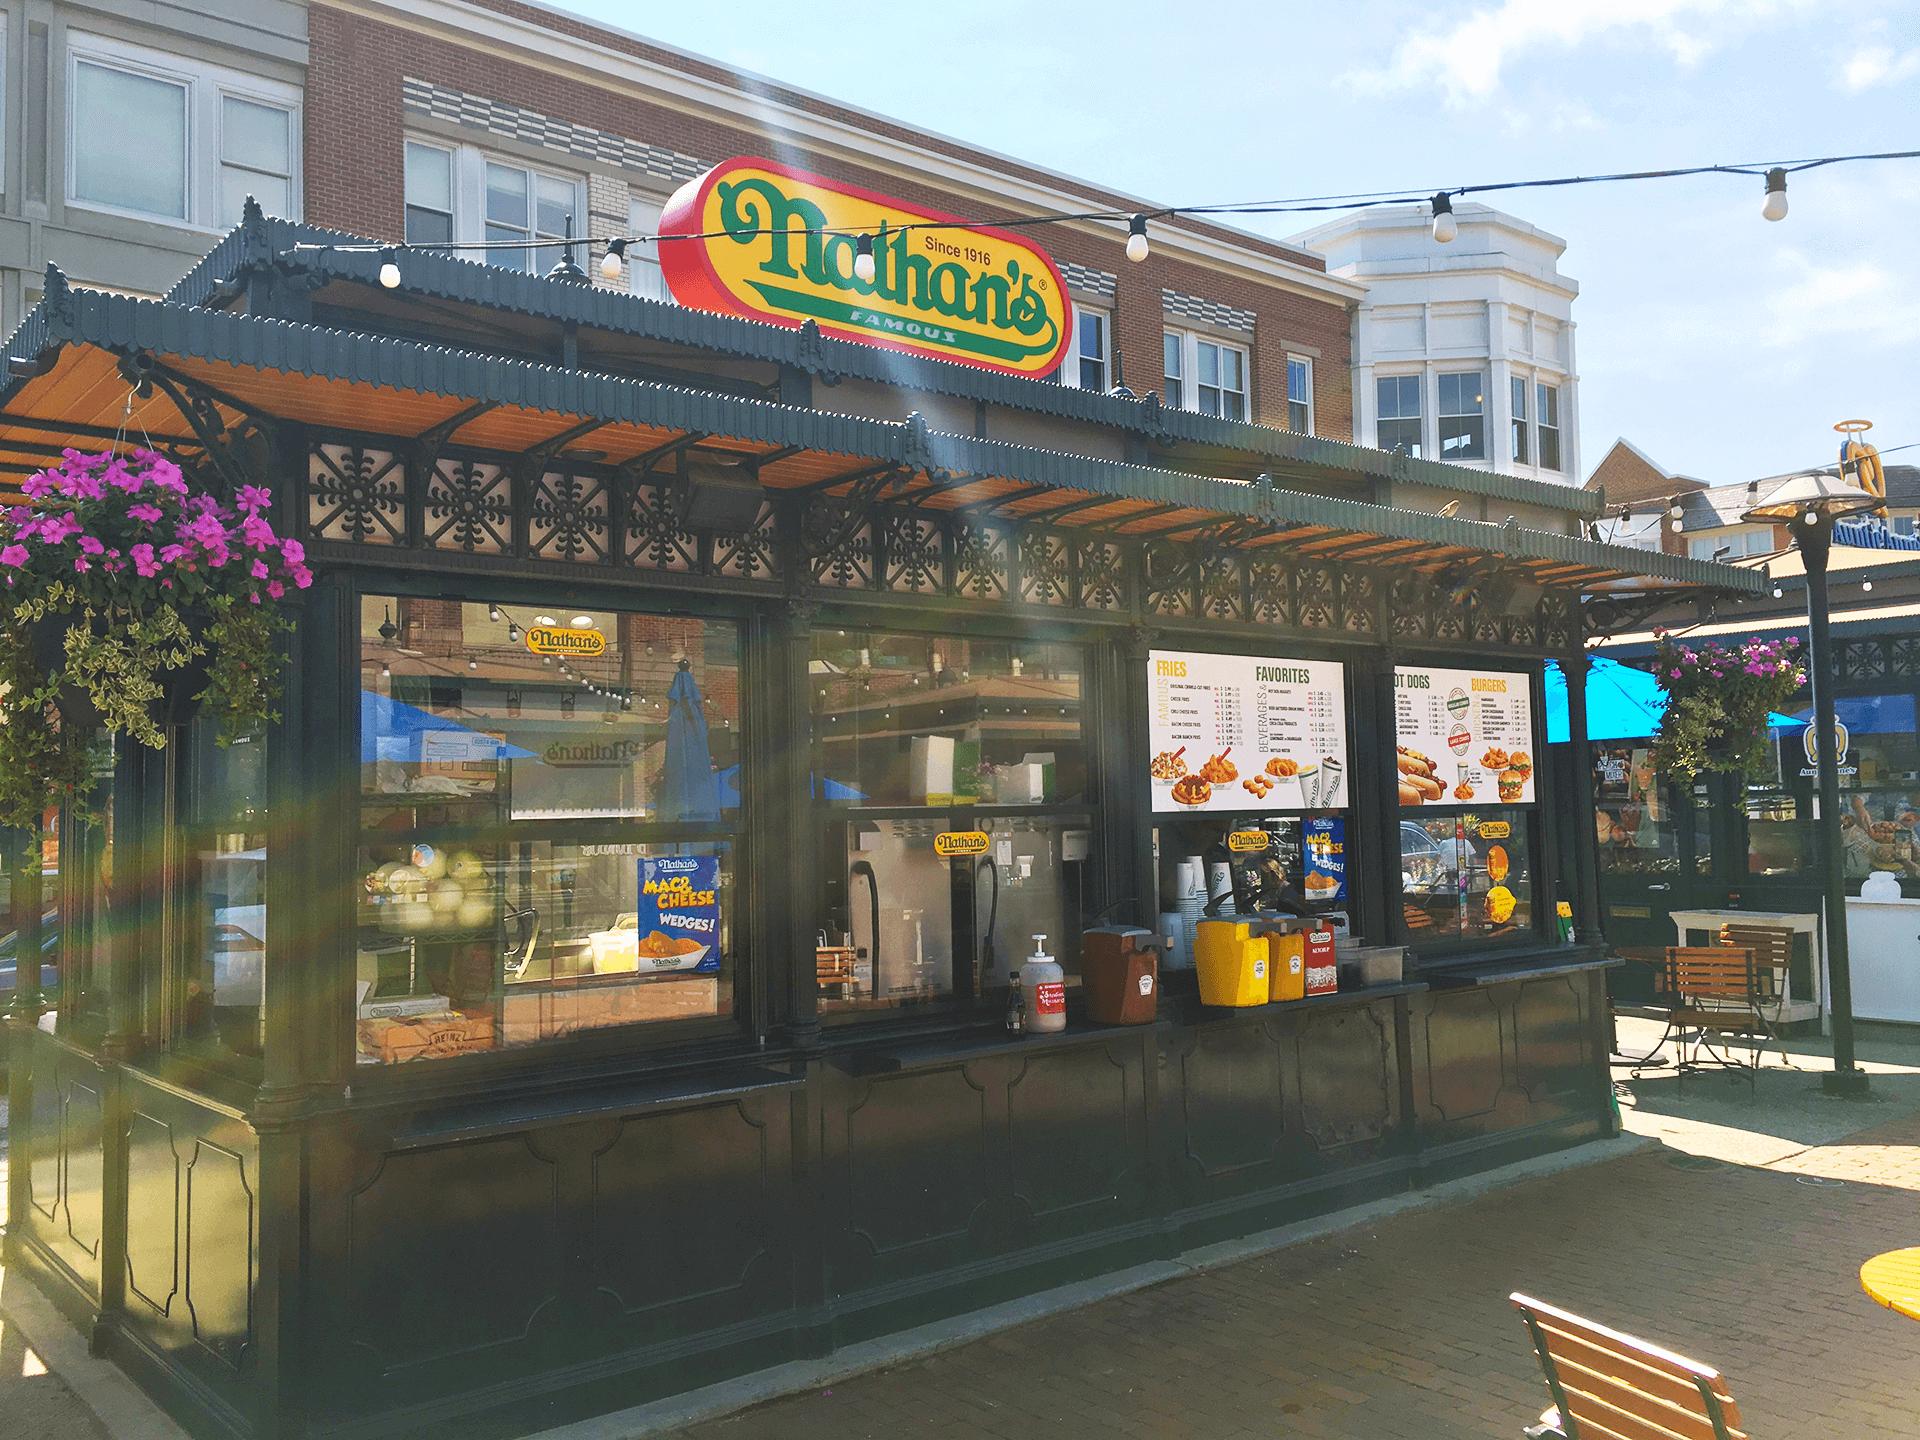 Nathan's Hotdogs